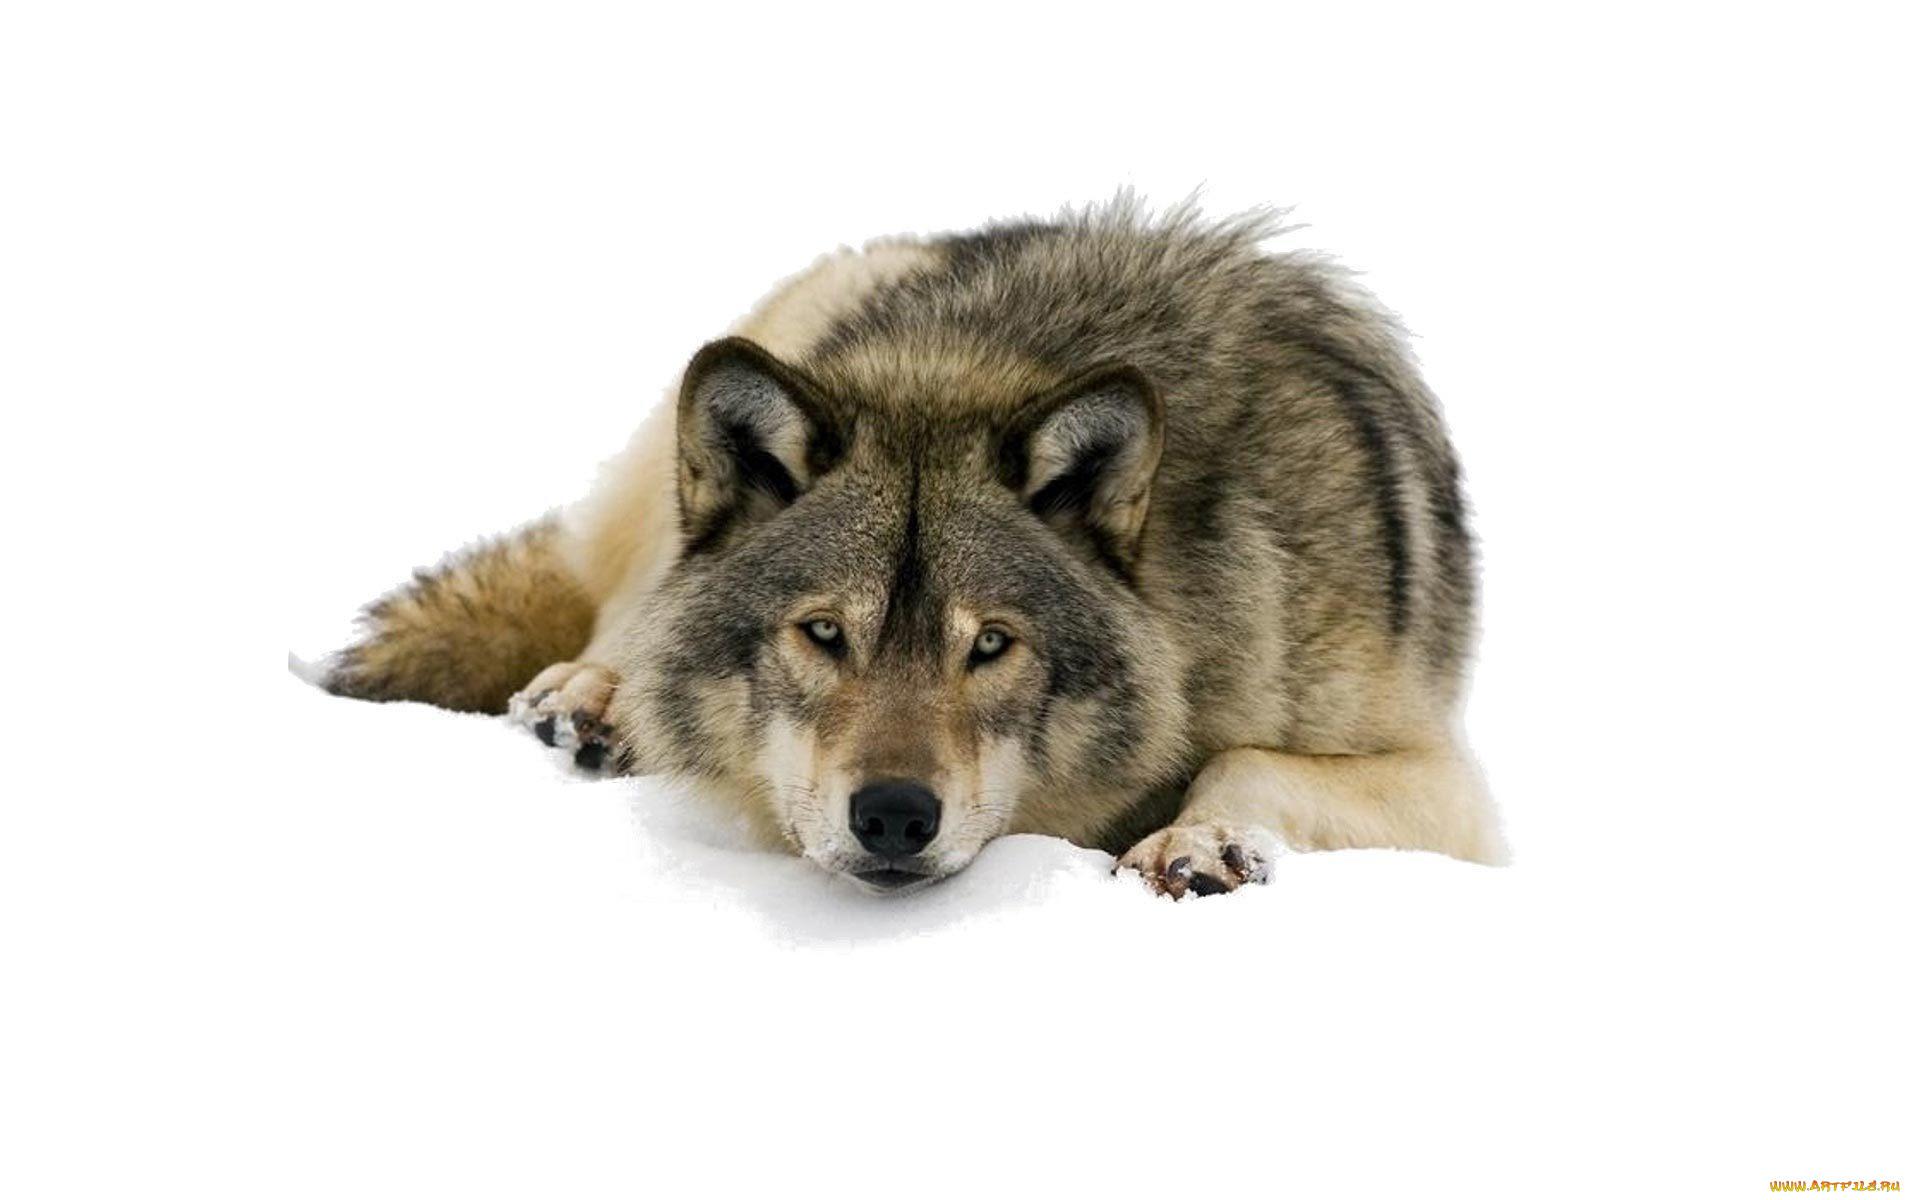 Игра 1700 Игр Работа Не Волк